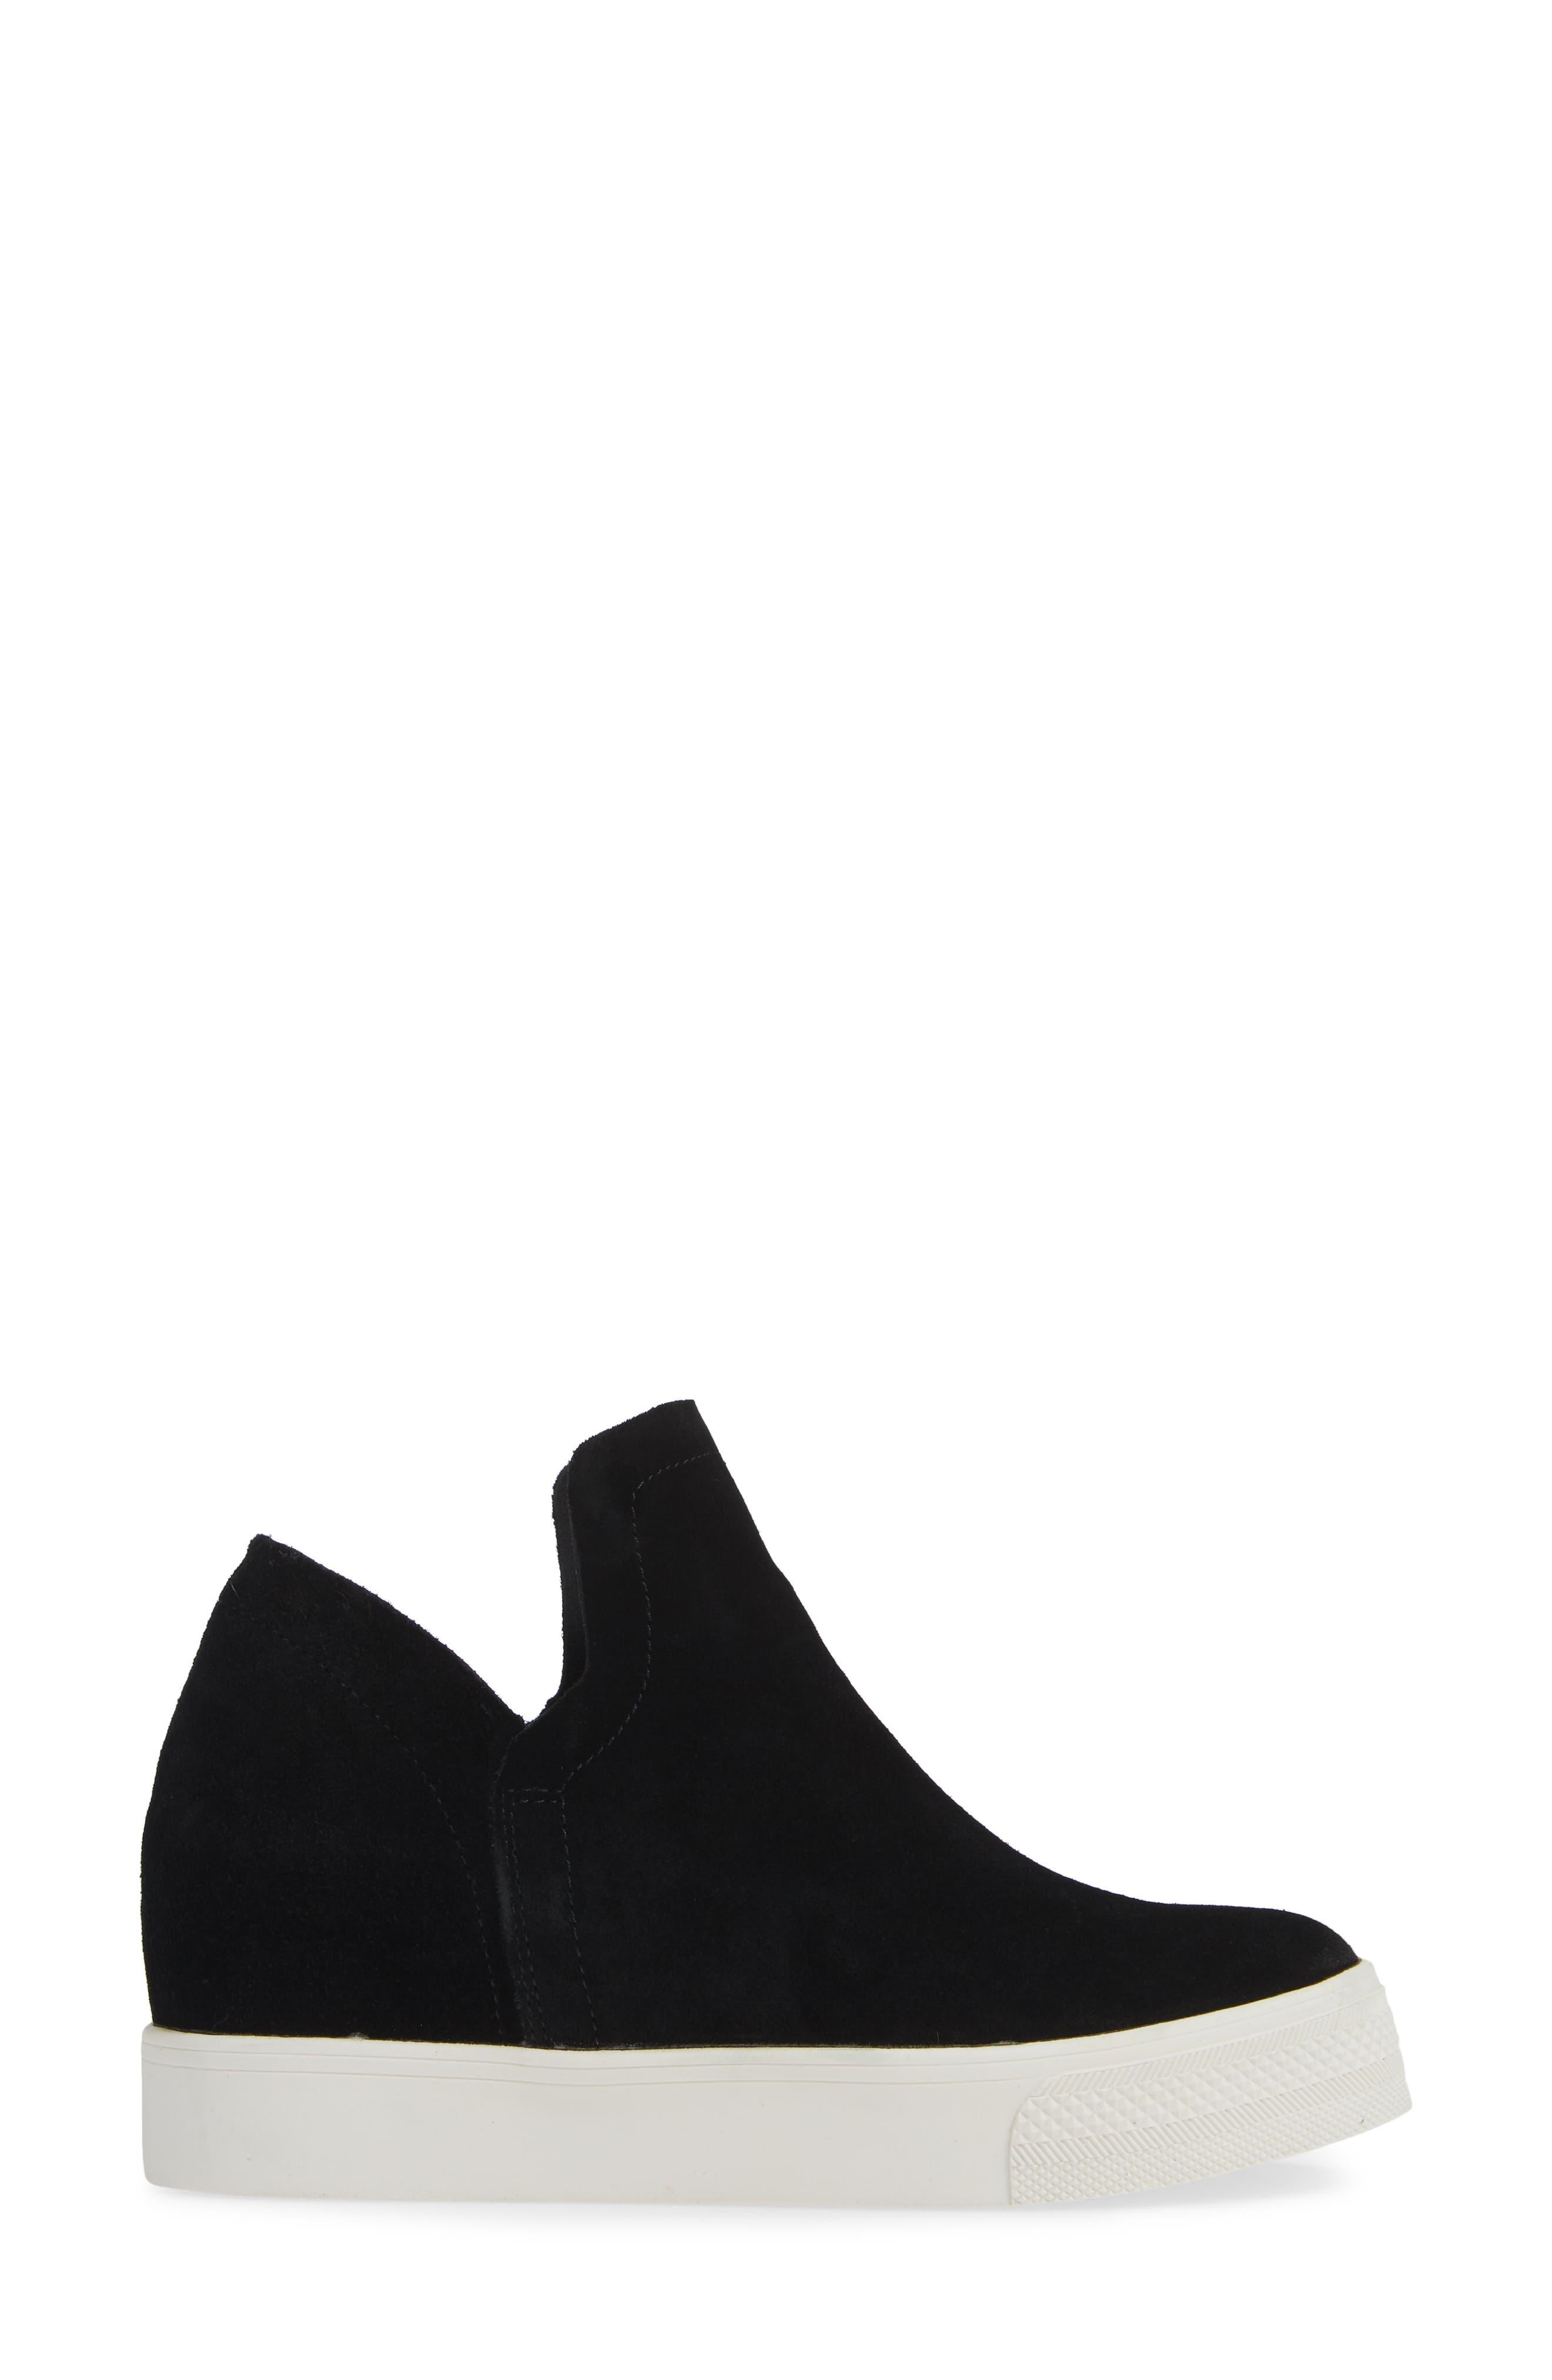 Wrangle Sneaker,                             Alternate thumbnail 3, color,                             BLACK SUEDE